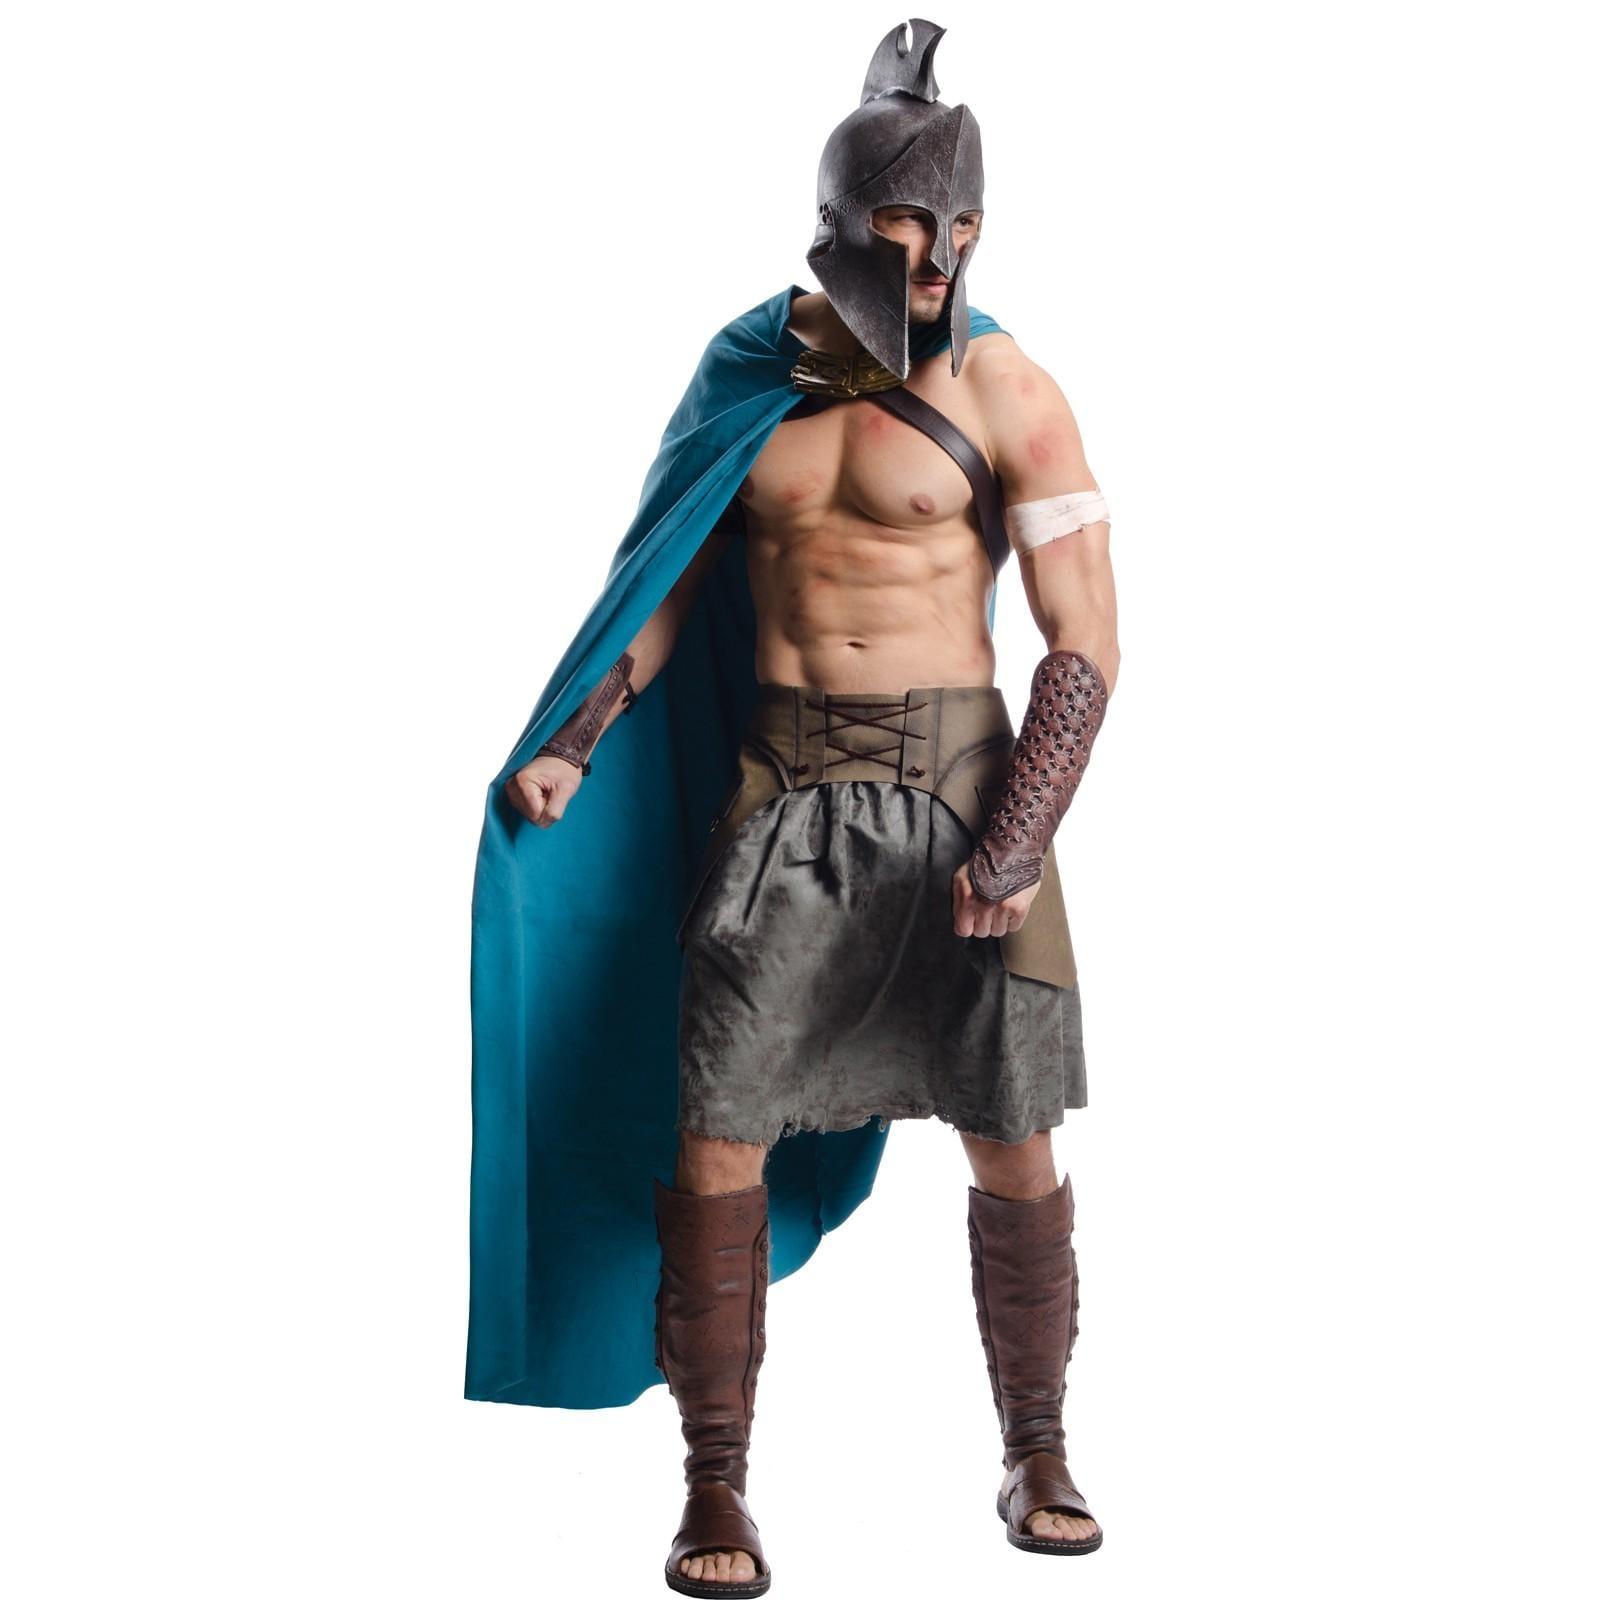 Halloween Costumes For Men 2018 - 300 Themistocles Costume  sc 1 st  List Top 10 & 10 Best Halloween Costume Ideas For Men 2018